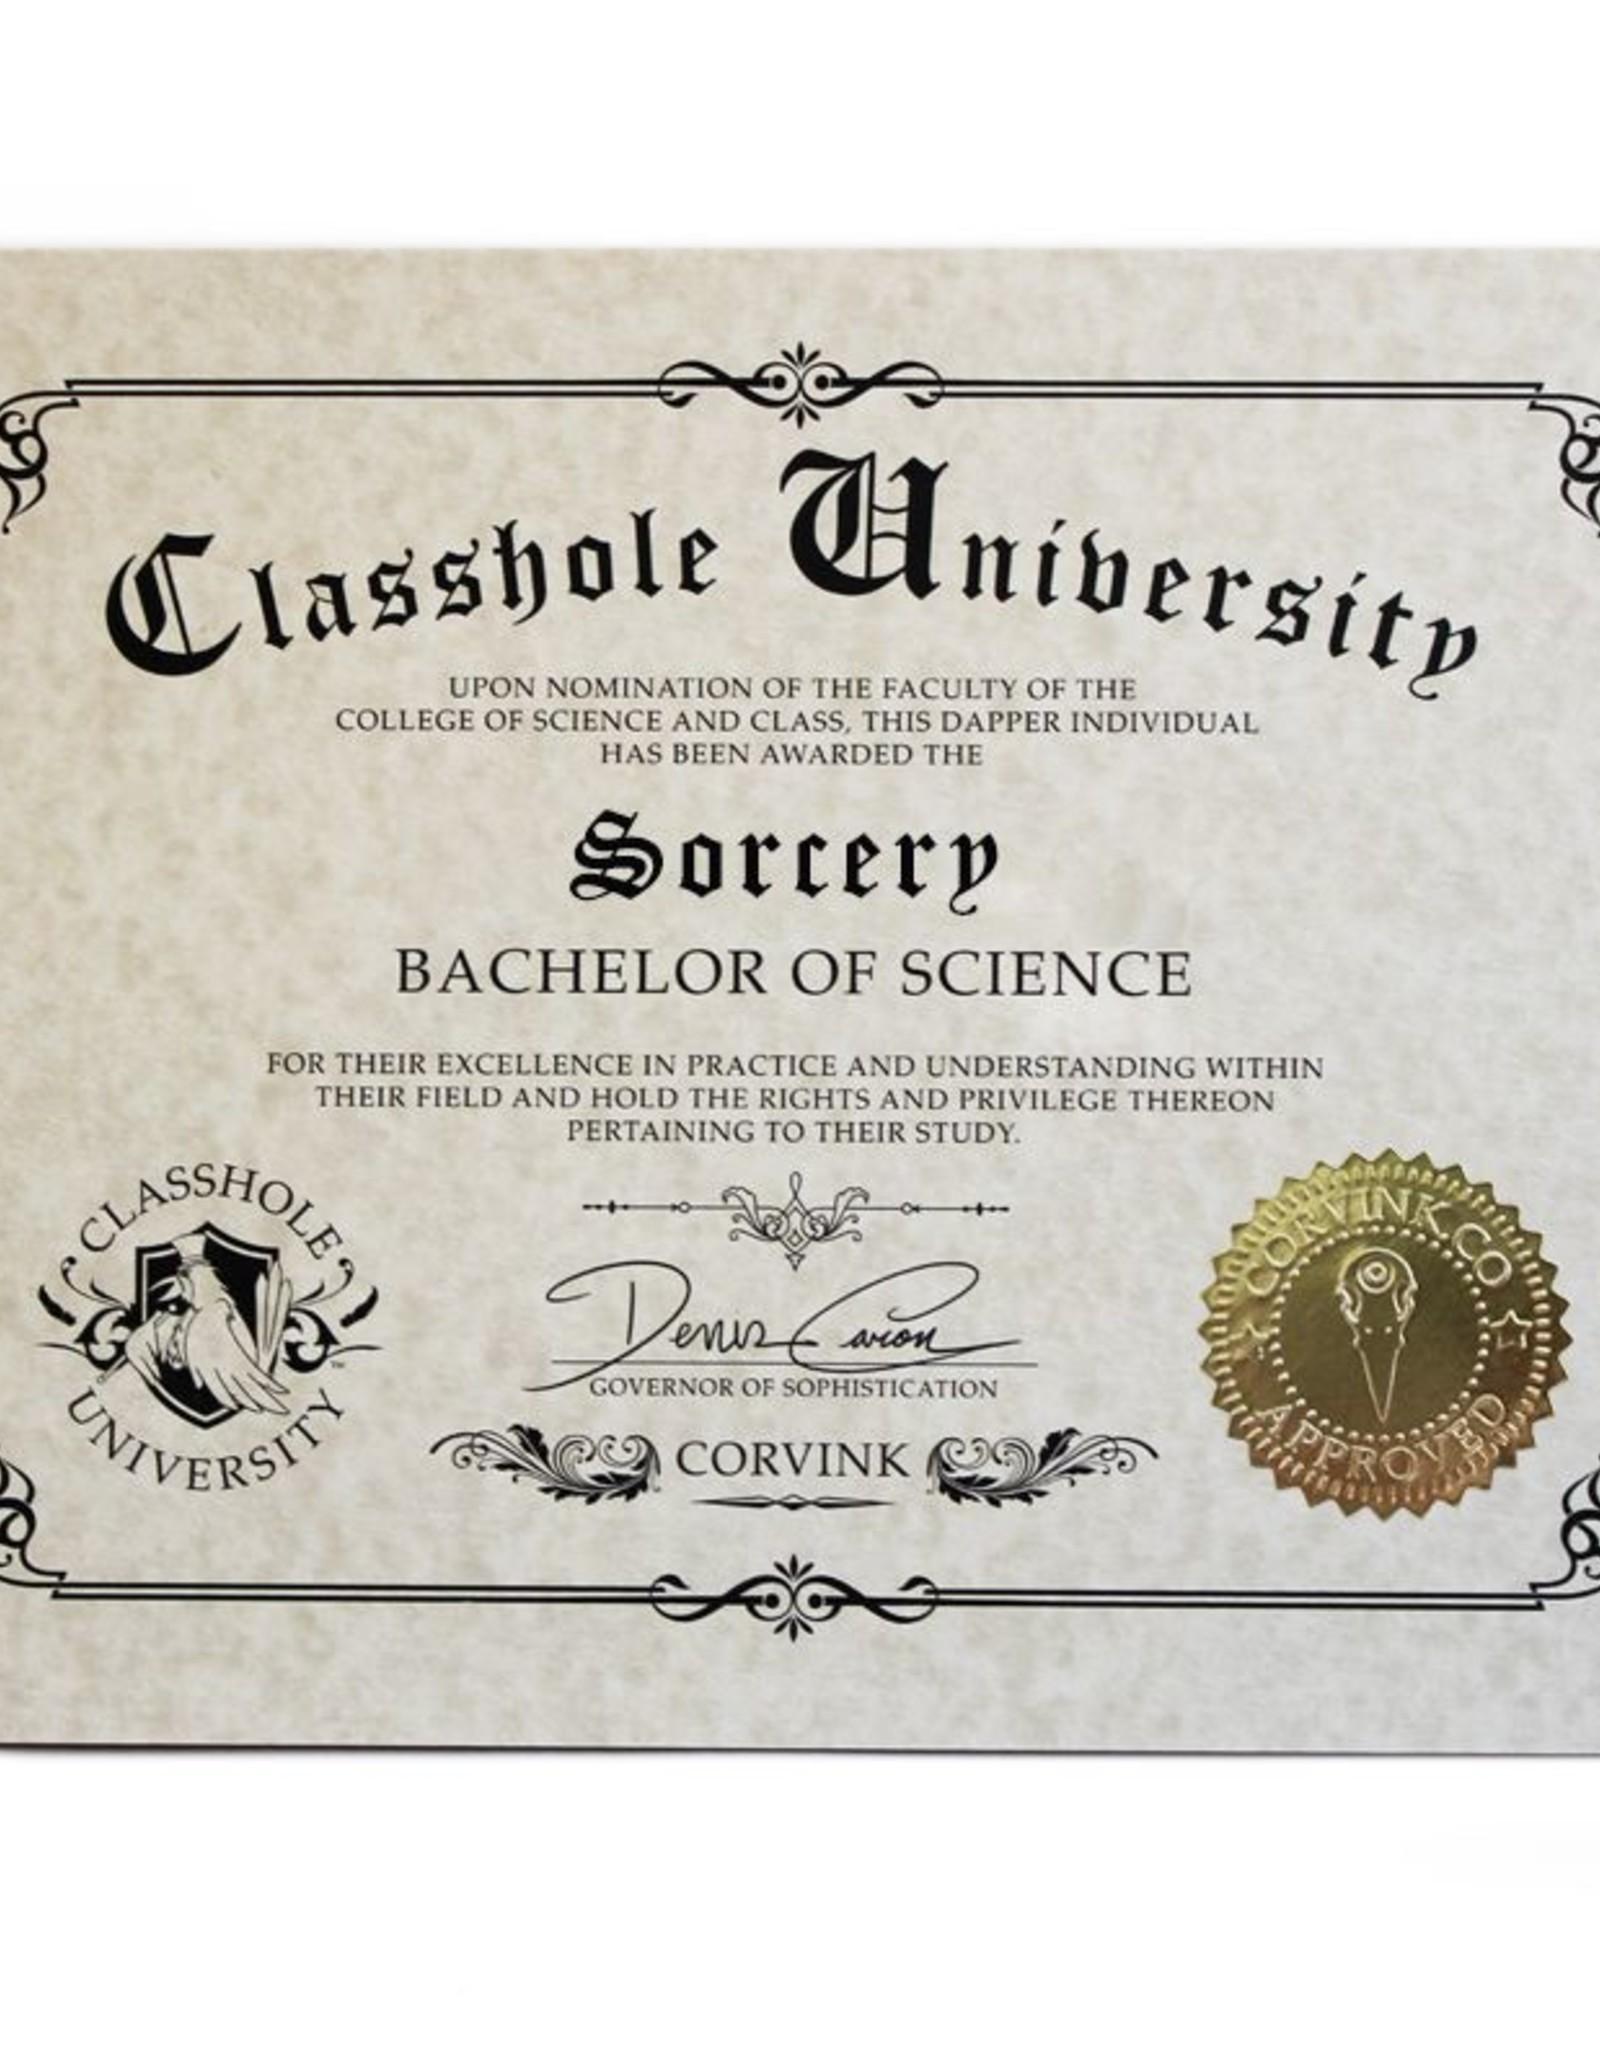 Classhole University BS Diplomas - Sorcery